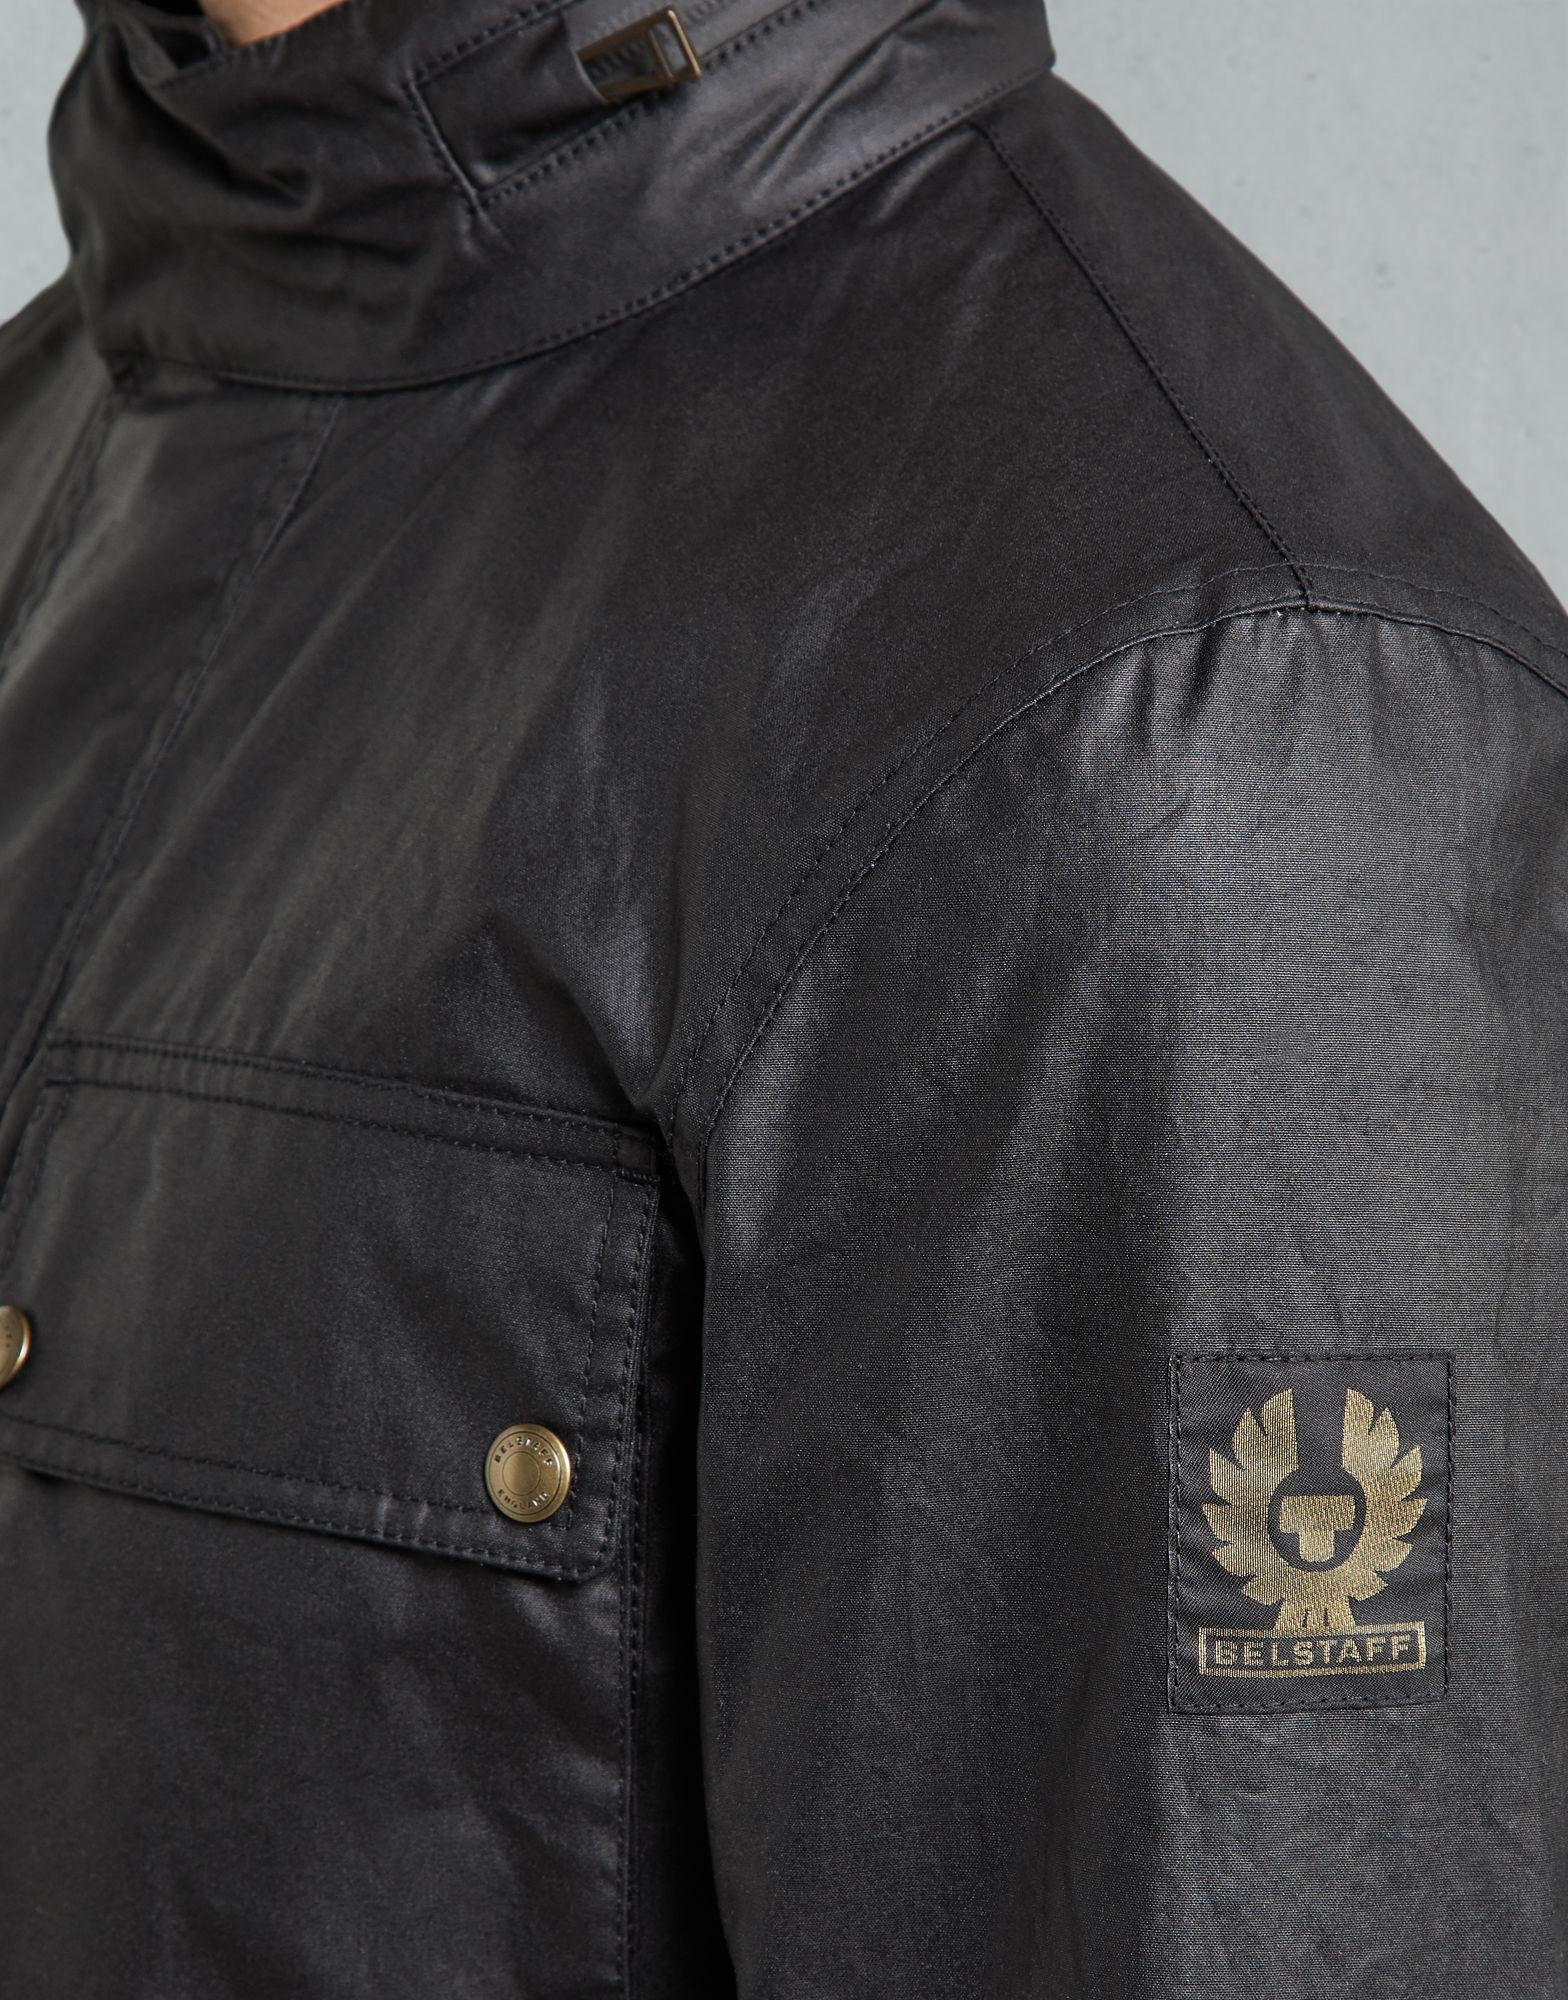 47cf416fbe Lyst - Belstaff Explorer Jacket in Black for Men